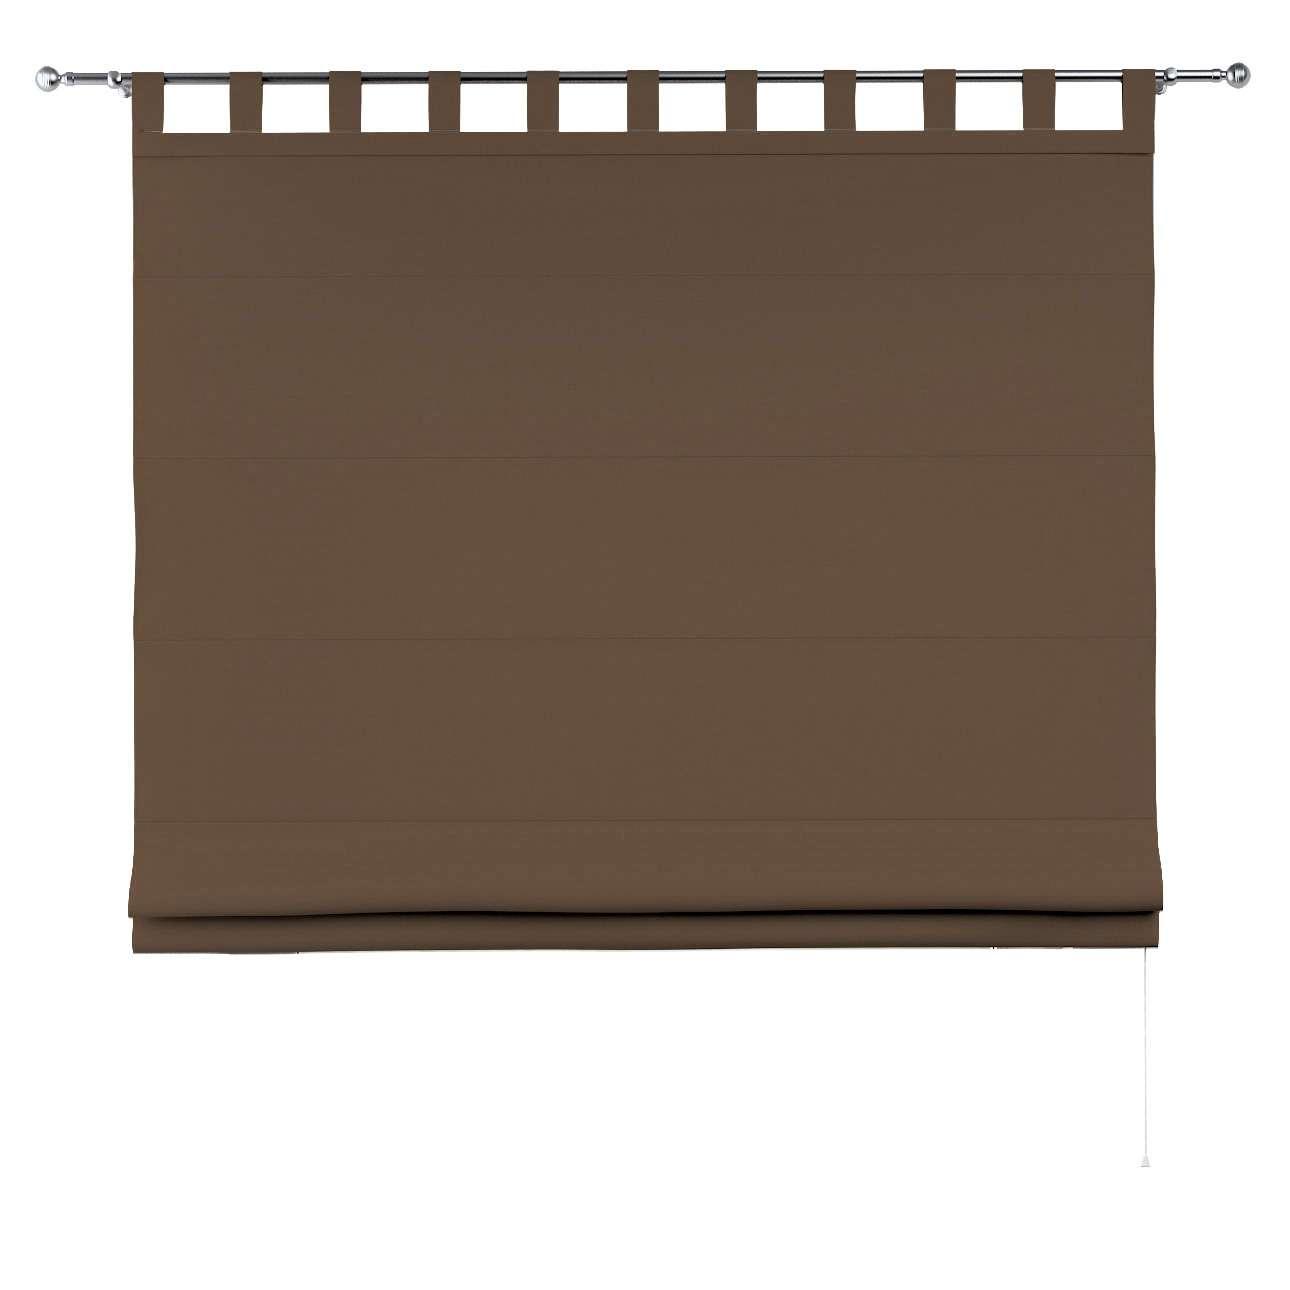 Rímska roleta Verona 80 x 170 cm V kolekcii Cotton Panama, tkanina: 702-02